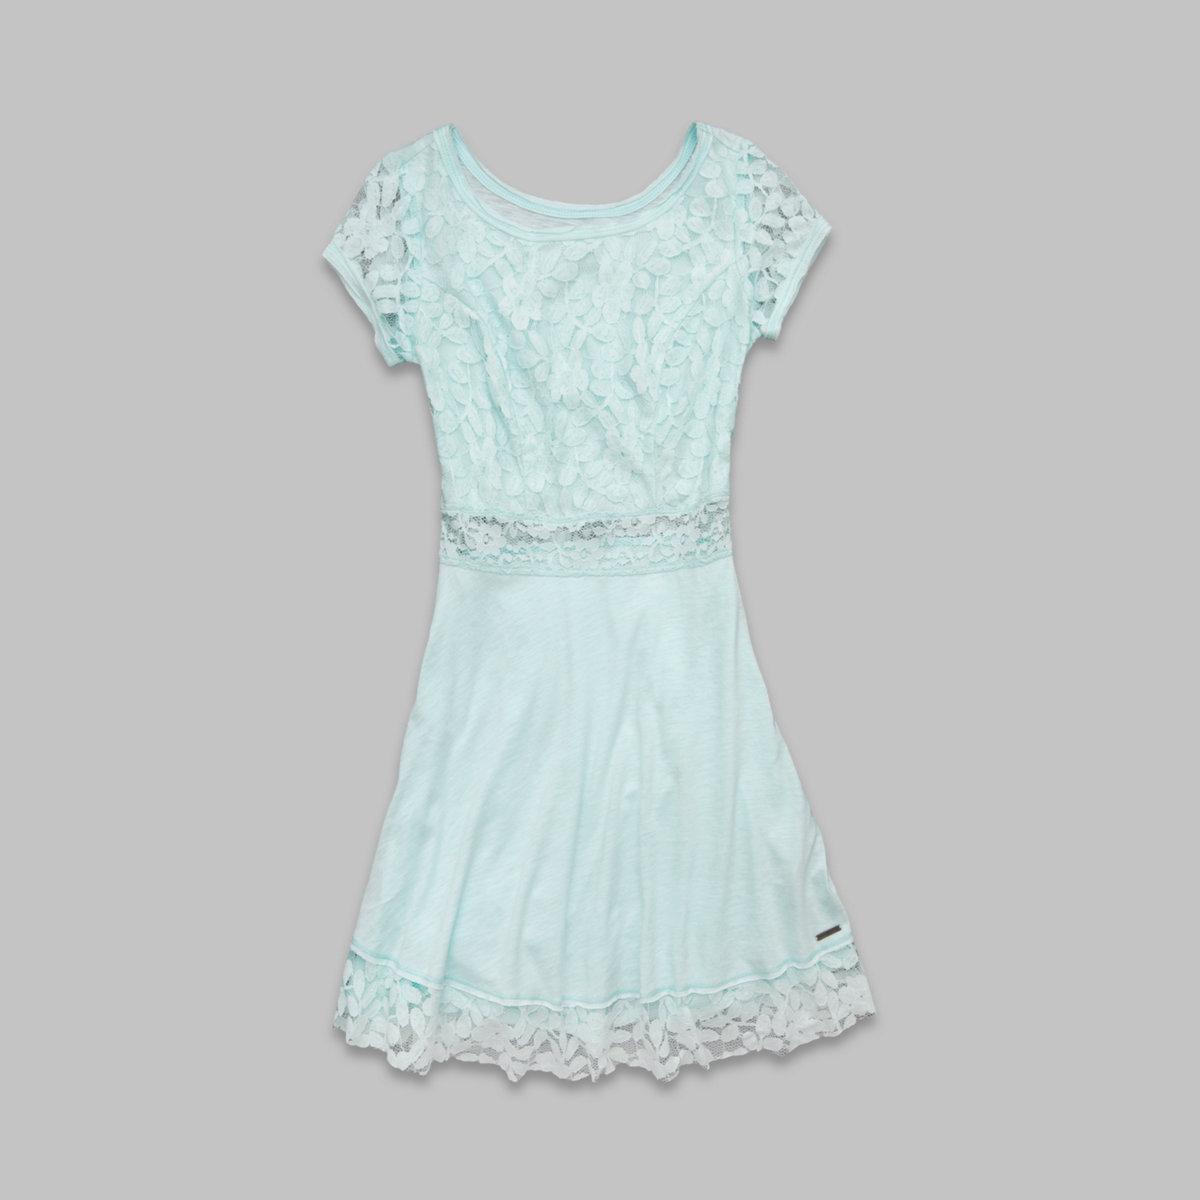 Molly Knit Skater Dress